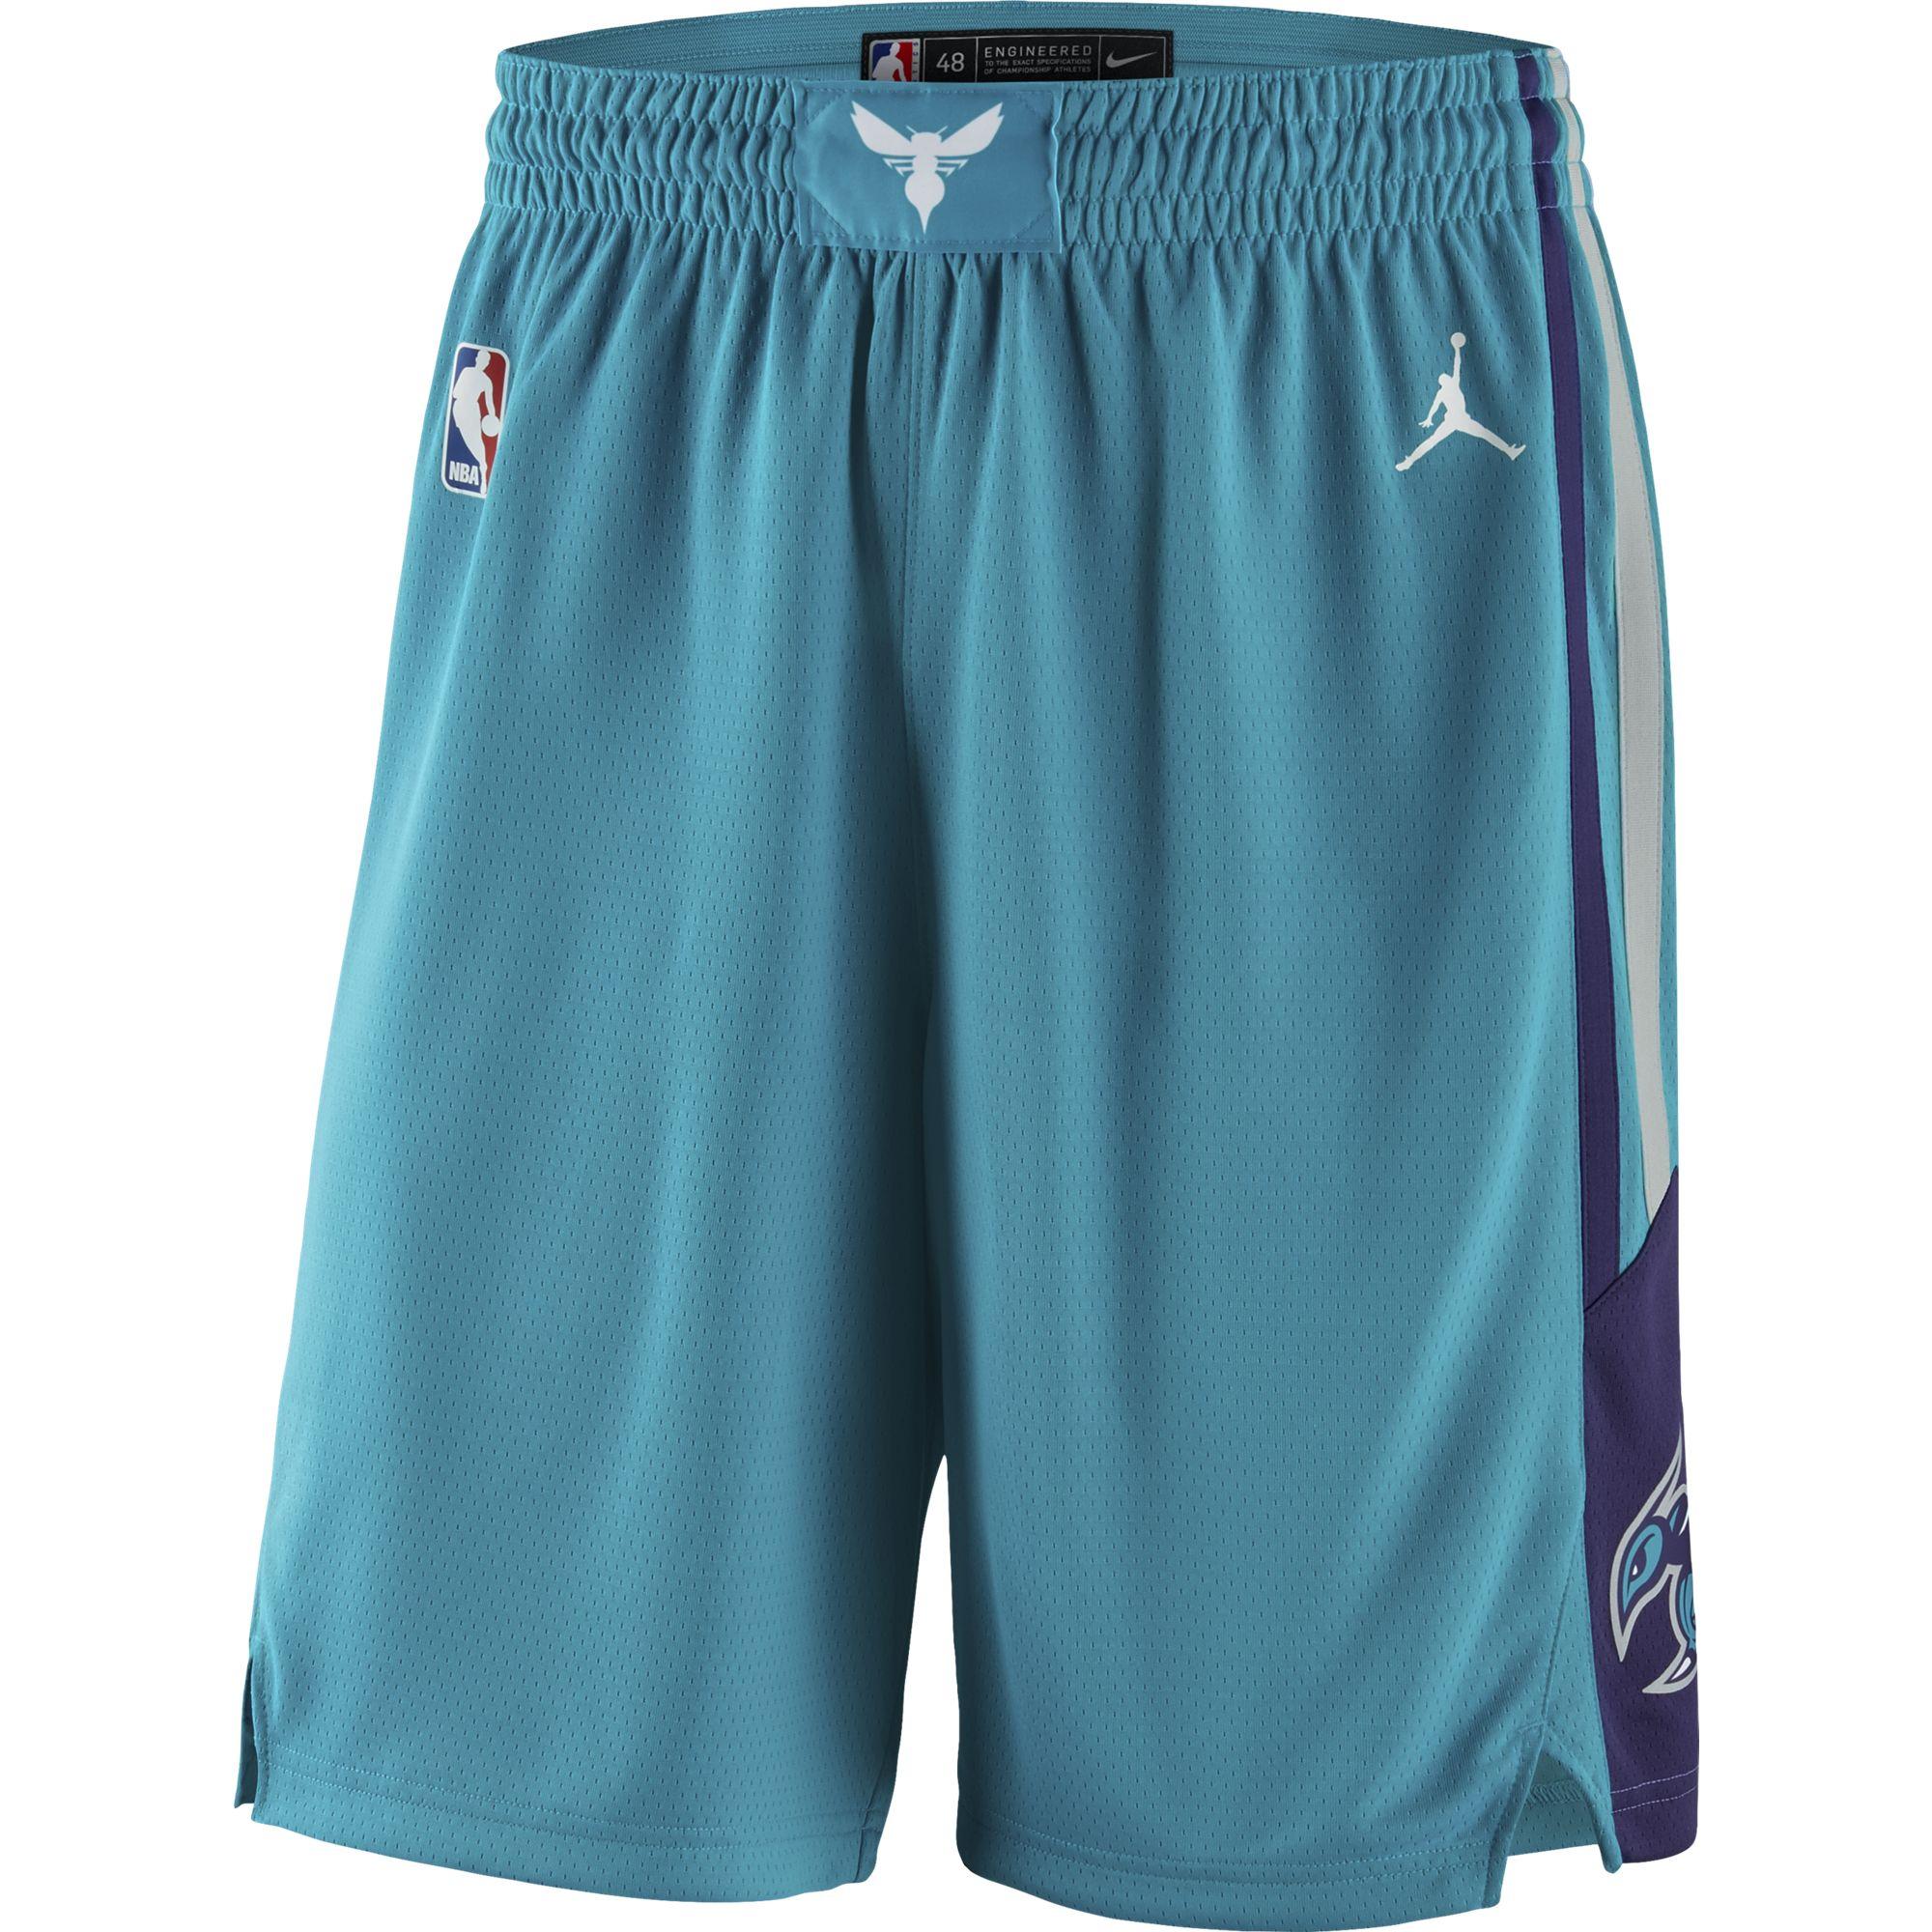 Charlotte Hornets Jordan Brand 2019/20 Icon Edition Swingman Shorts - Aqua